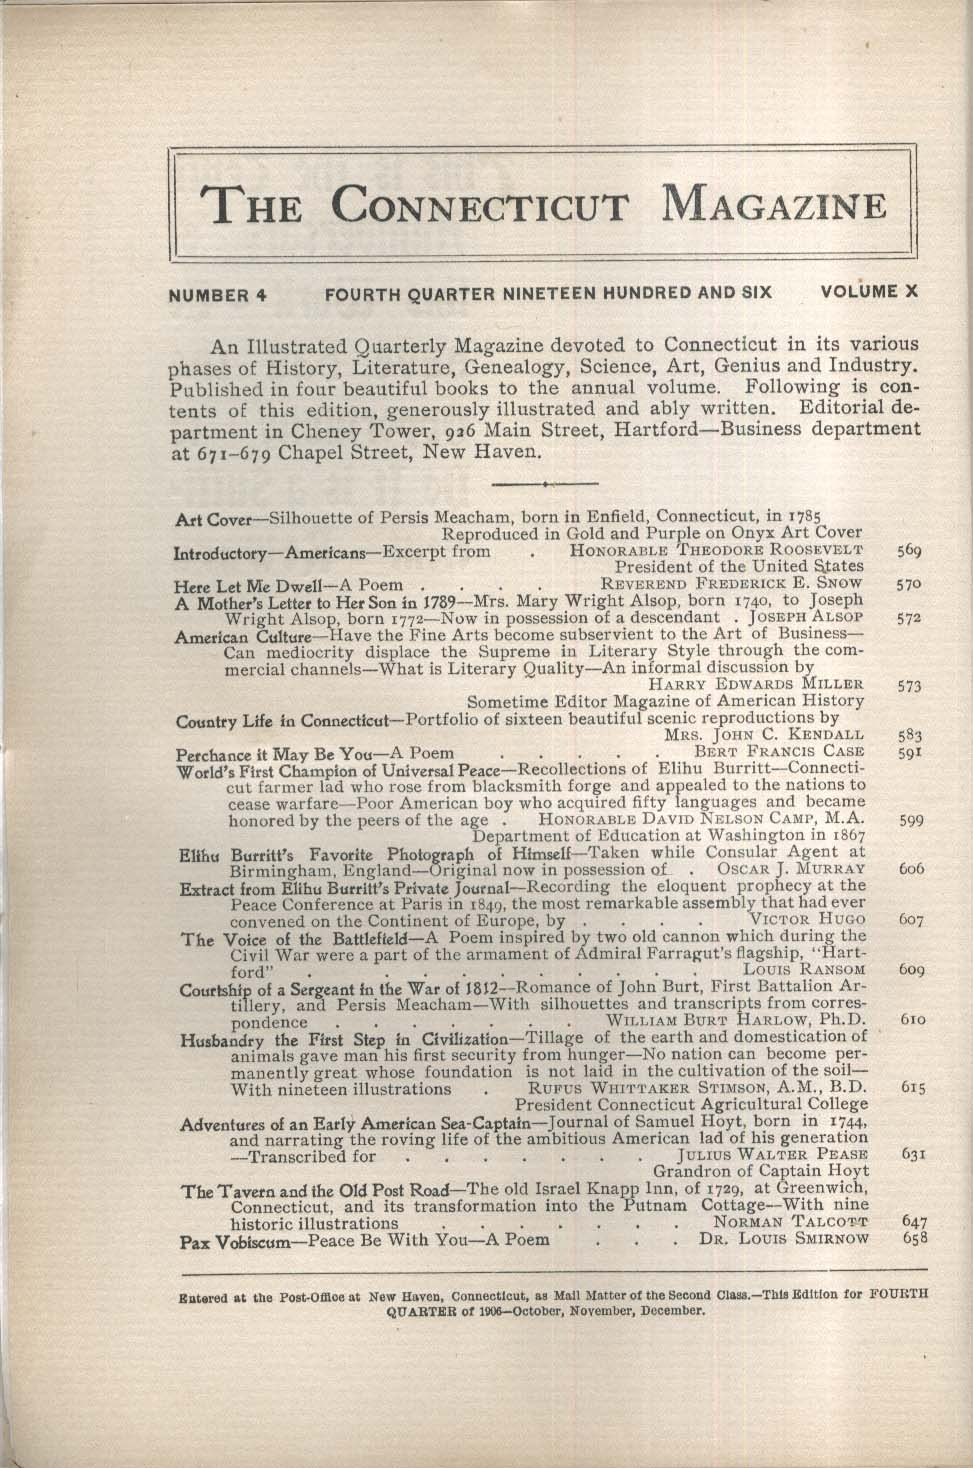 CONNECTICUT MAGAZINE Mary Wright Alsop Elihu Burritt 1906